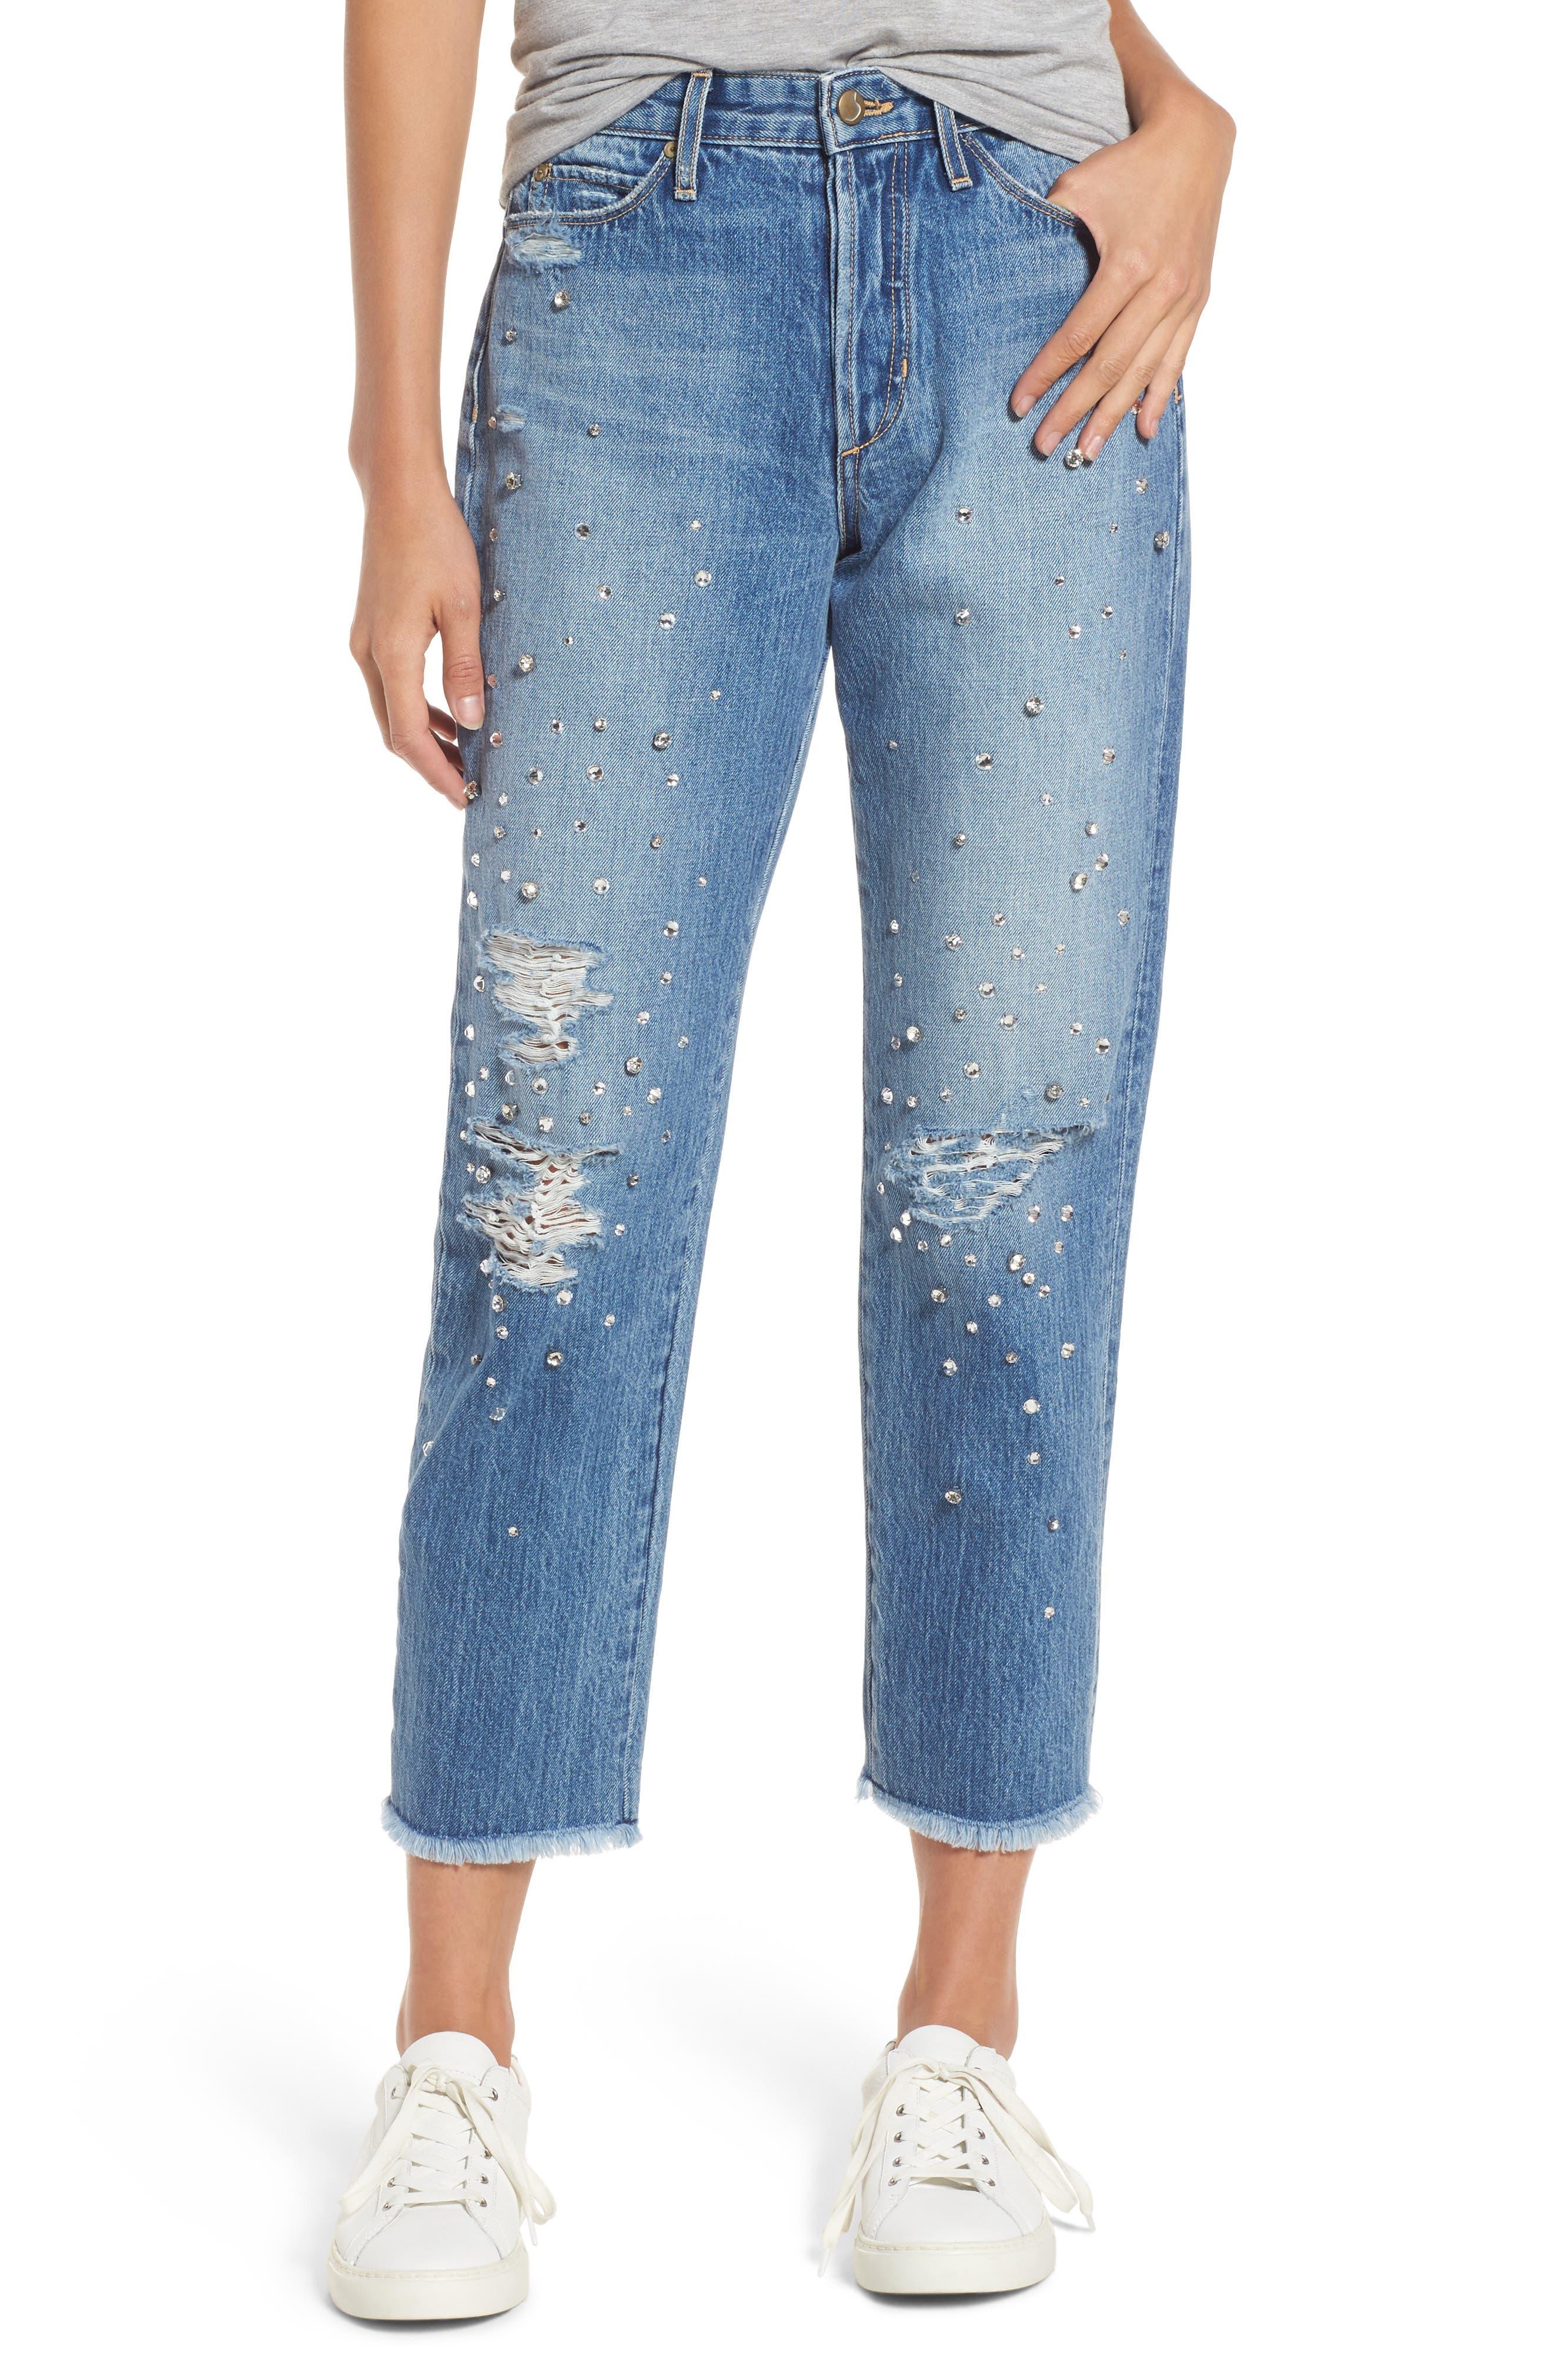 Jeans Smith Rhinestone Crop Boyfriend Jeans,                         Main,                         color, Cyndi